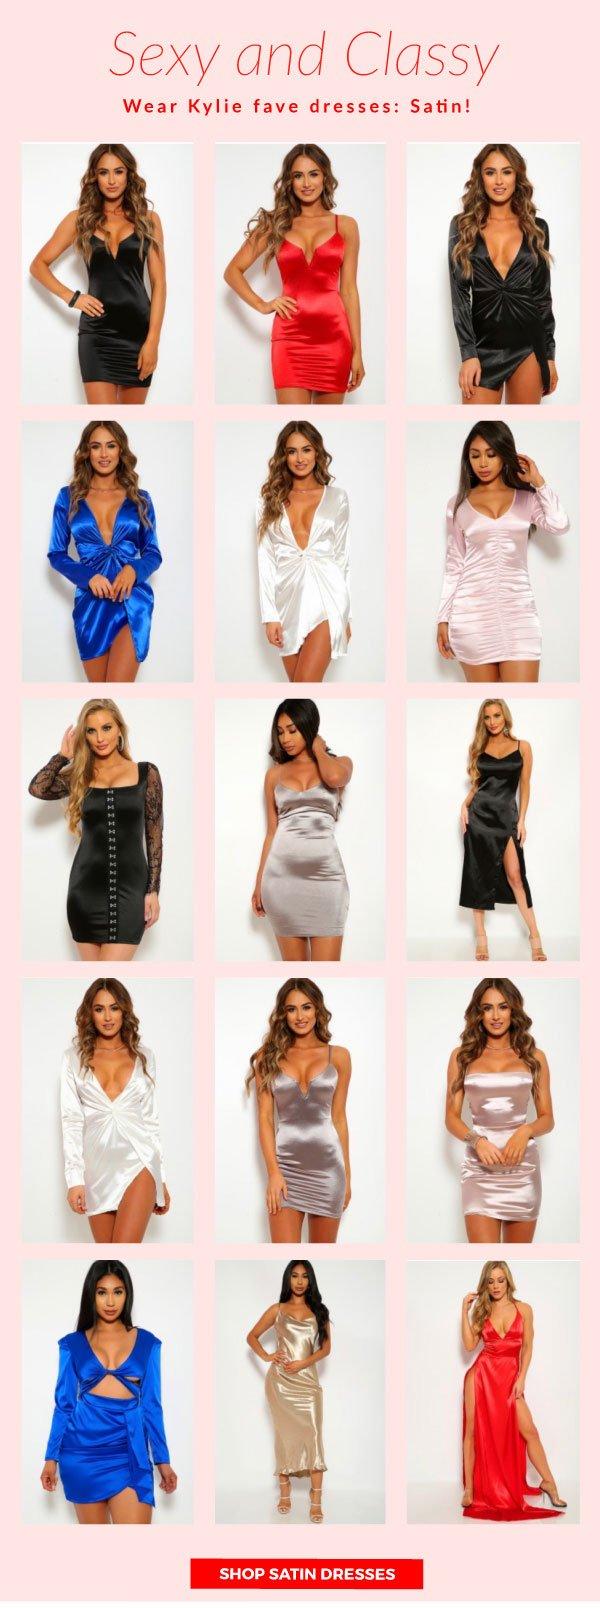 Shop Satin Dresses